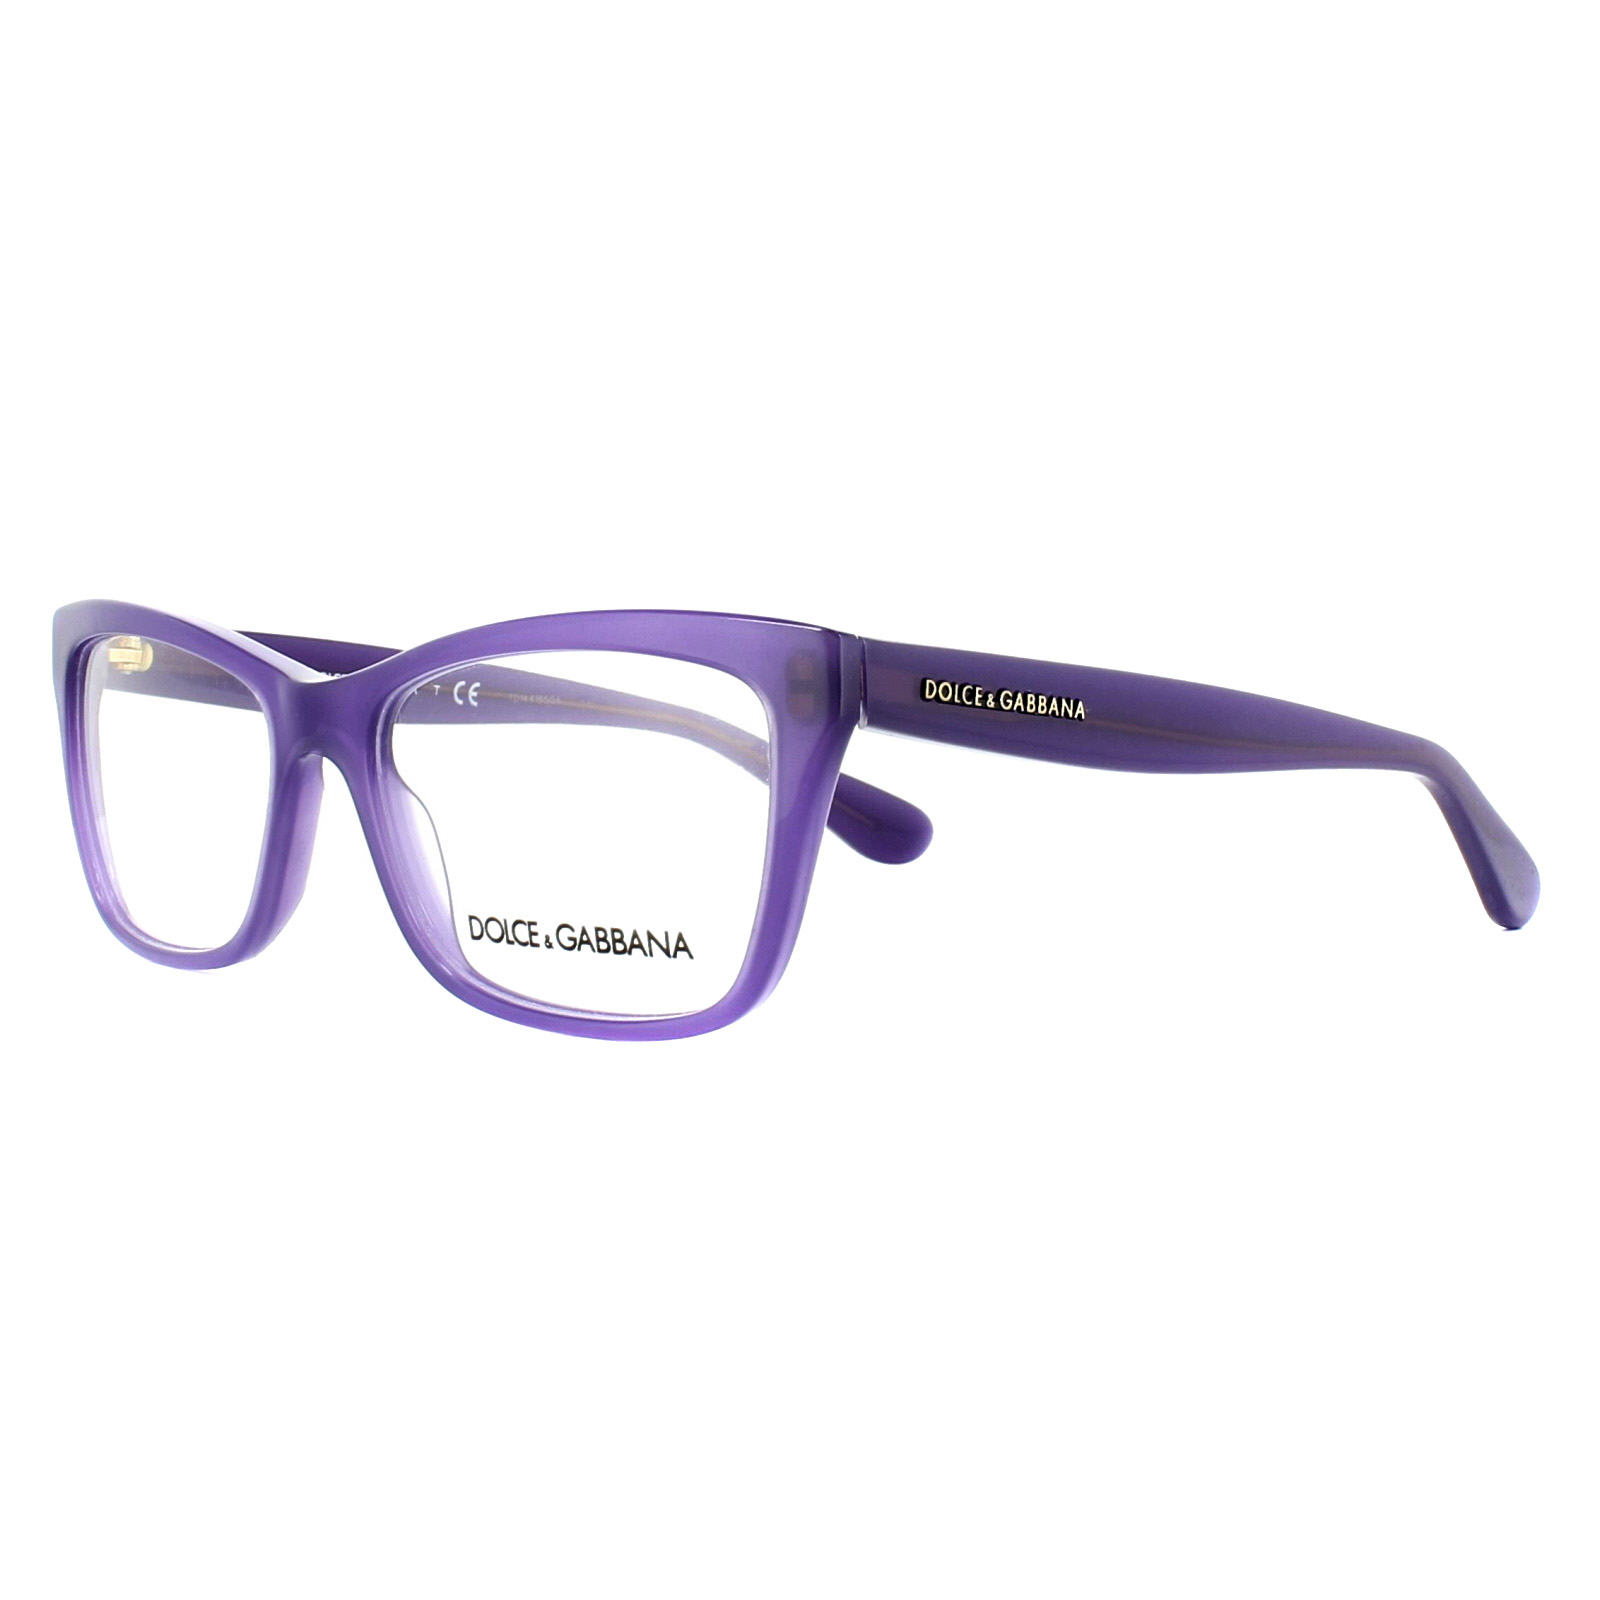 107994b371 Sentinel Dolce   Gabbana Glasses Frames DG 3215 2914 Opal Violet 52mm Womens